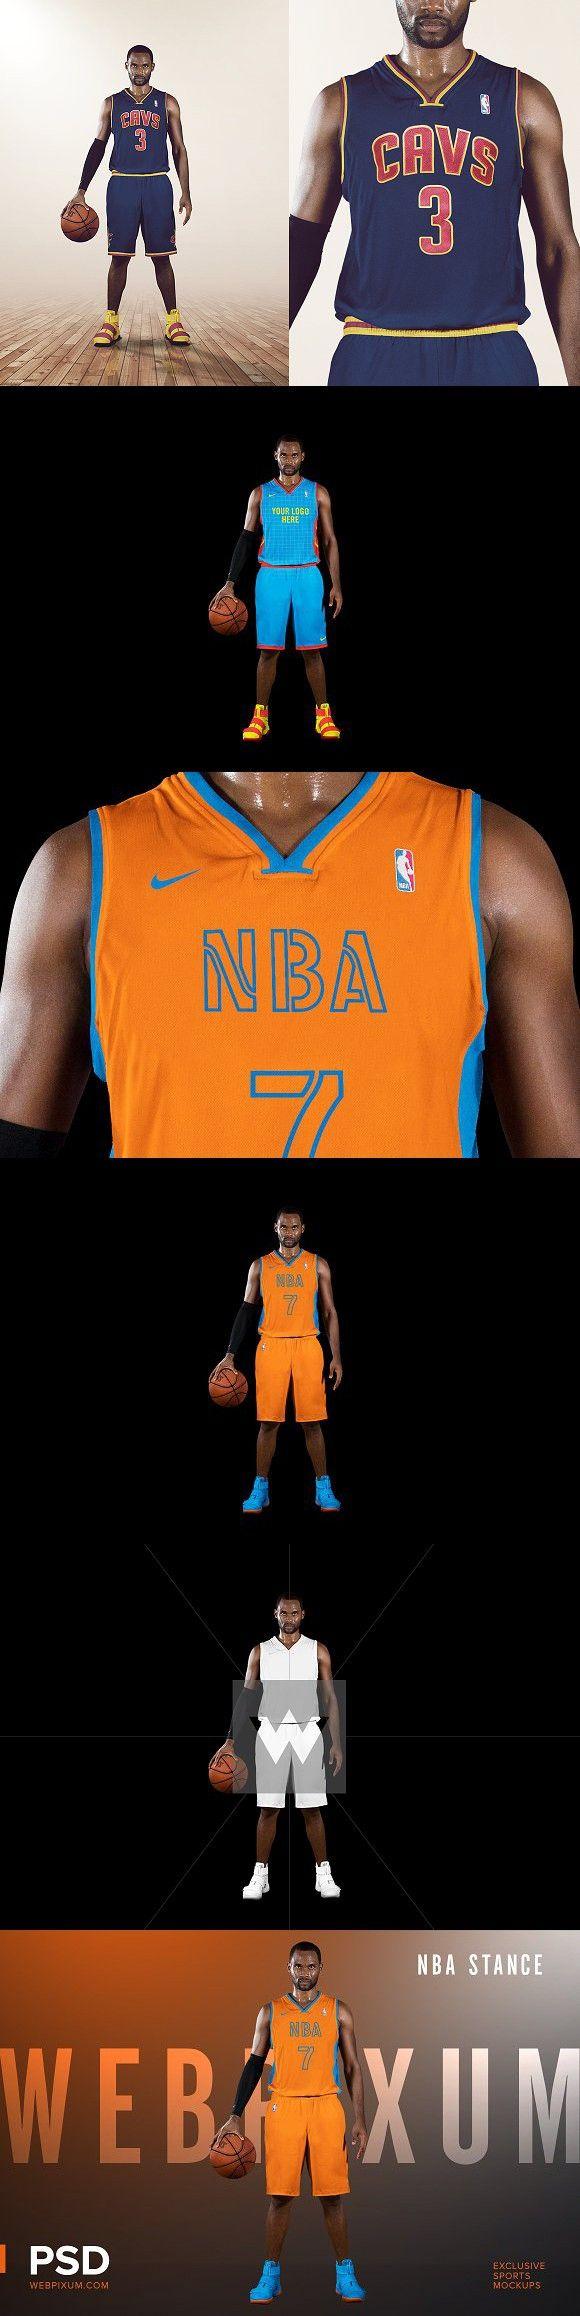 NBA Stance Mockup Template Templates, Mockup template